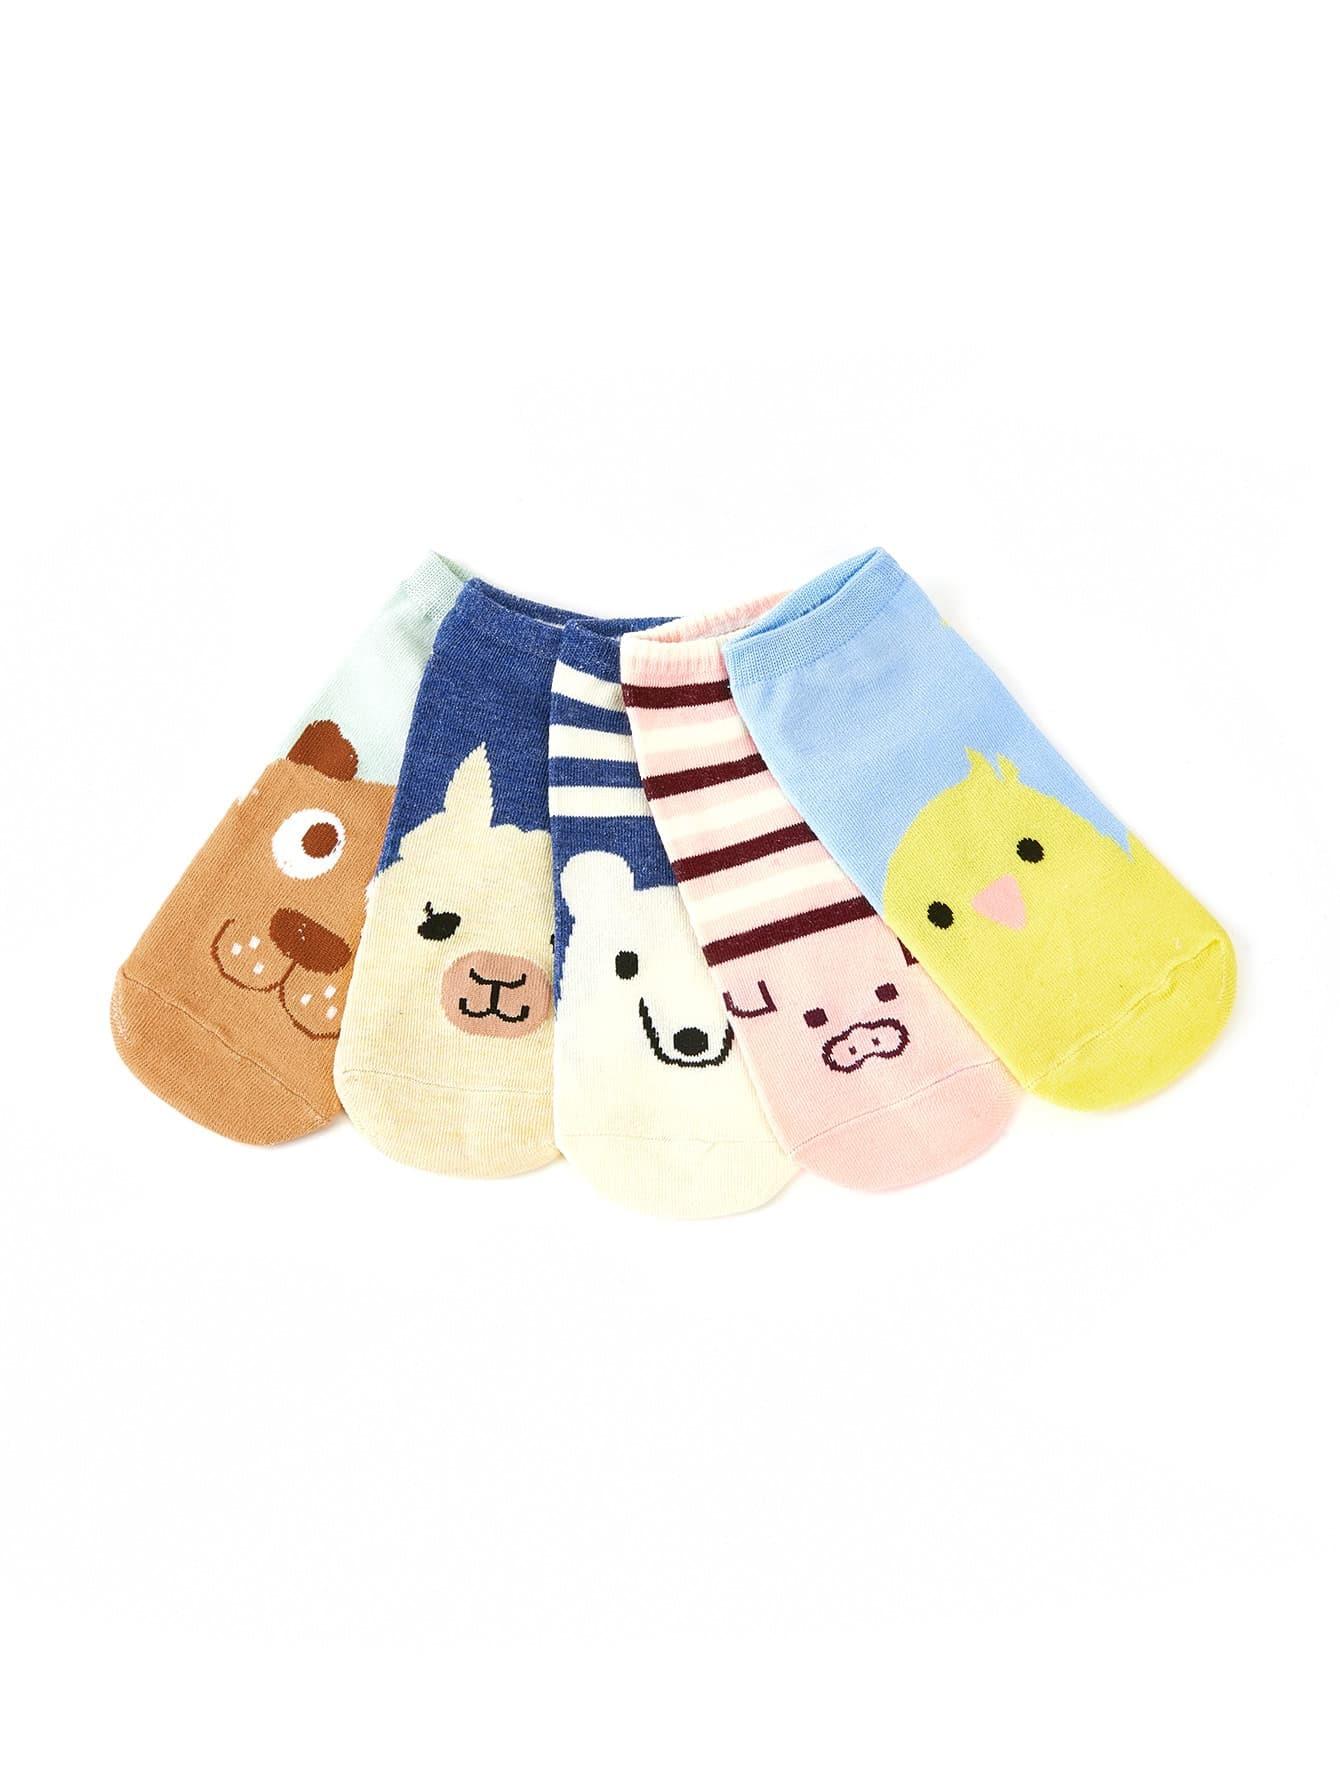 Animal Pattern Invisible Socks 5pairs женские чулки 1 5pairs